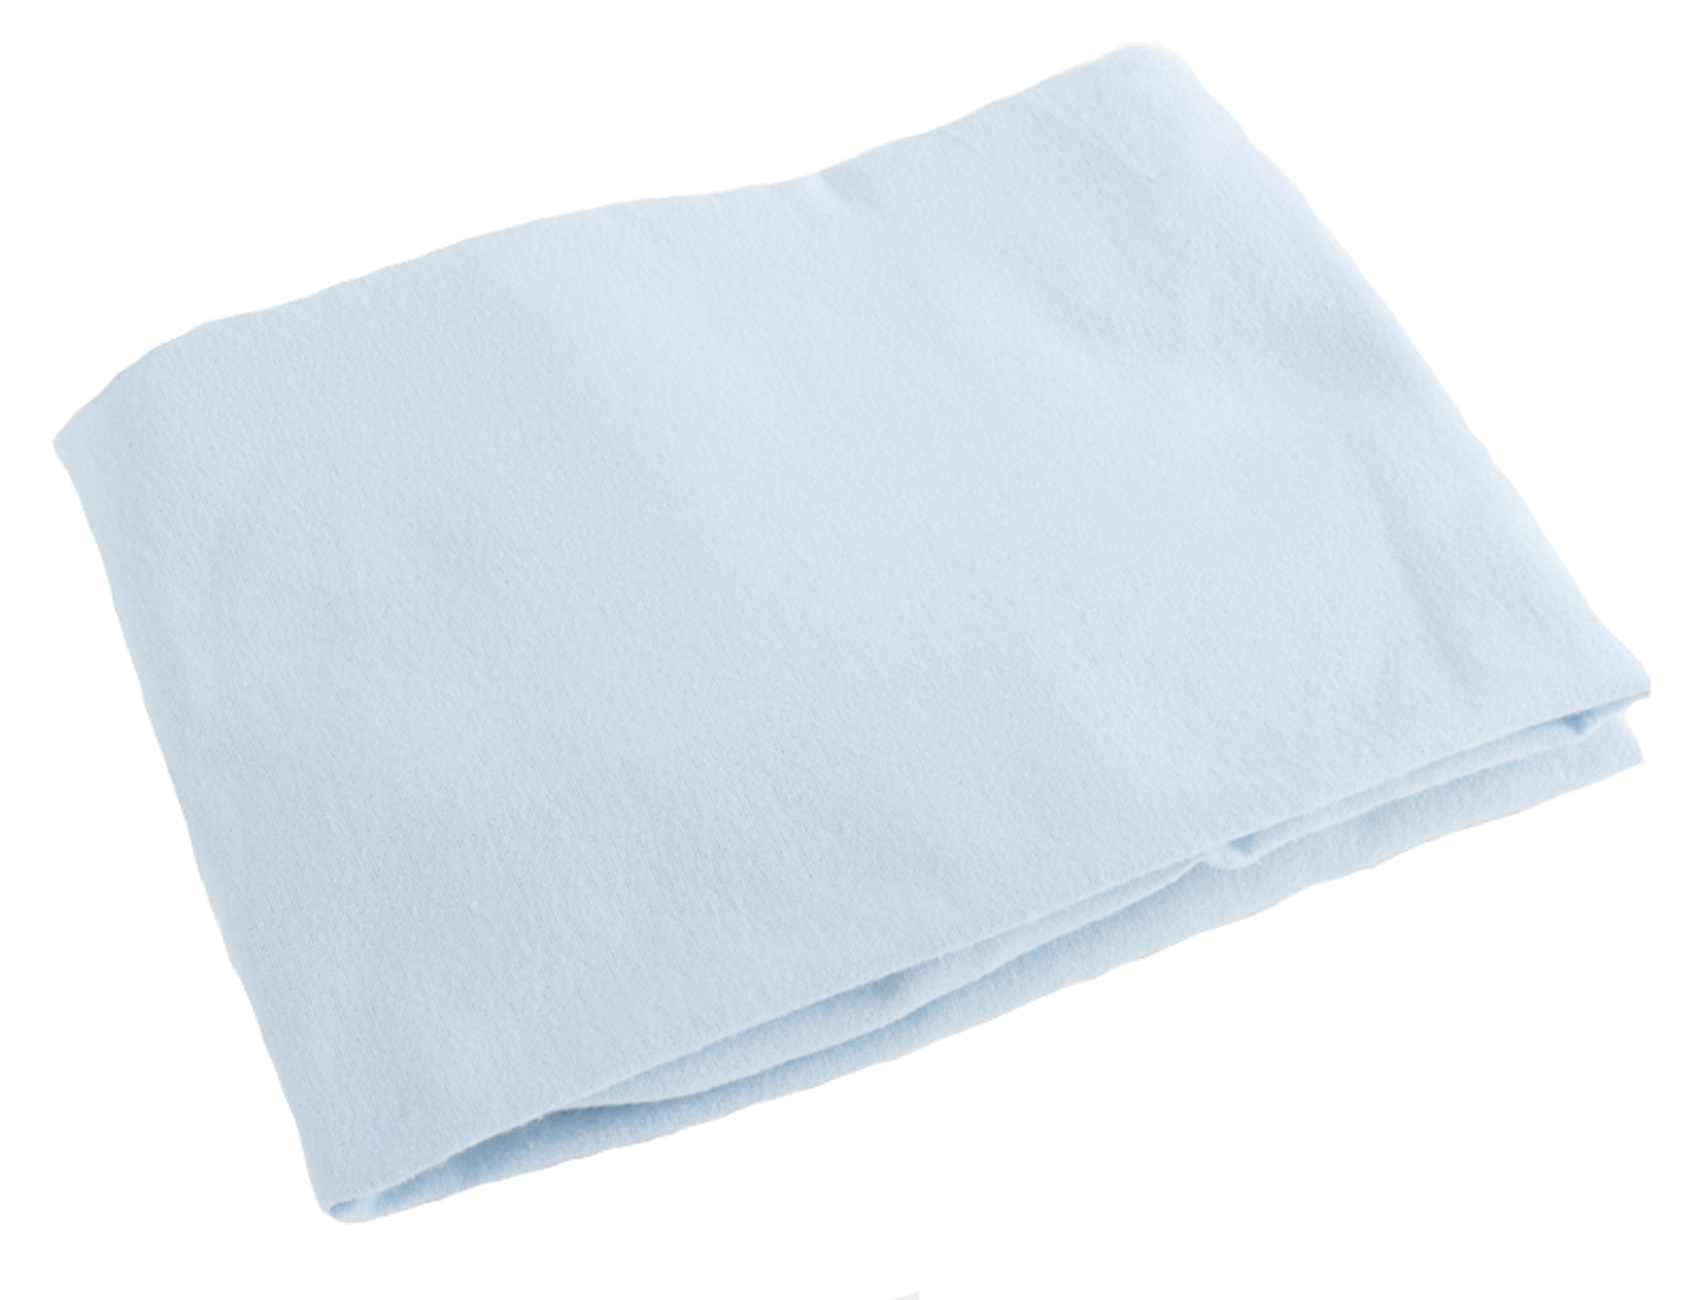 soft flannelette fitted cot bed sheet baby toddler nursery. Black Bedroom Furniture Sets. Home Design Ideas